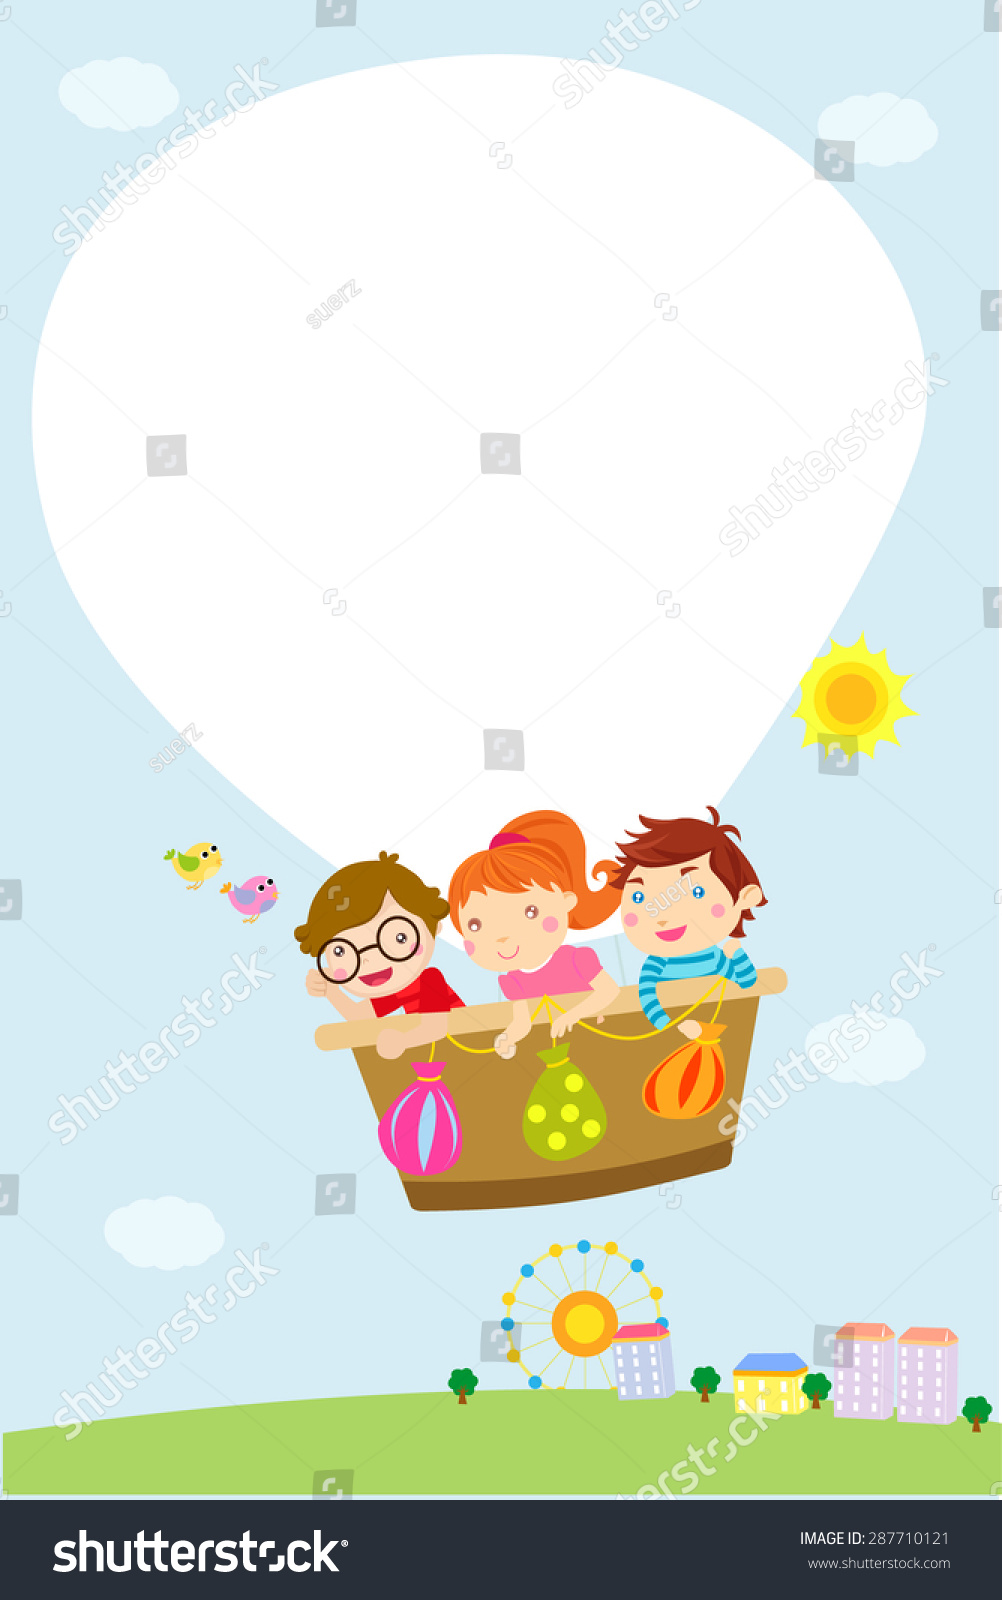 Kids Hot Balloon Frame Stock Vector Royalty Free 287710121